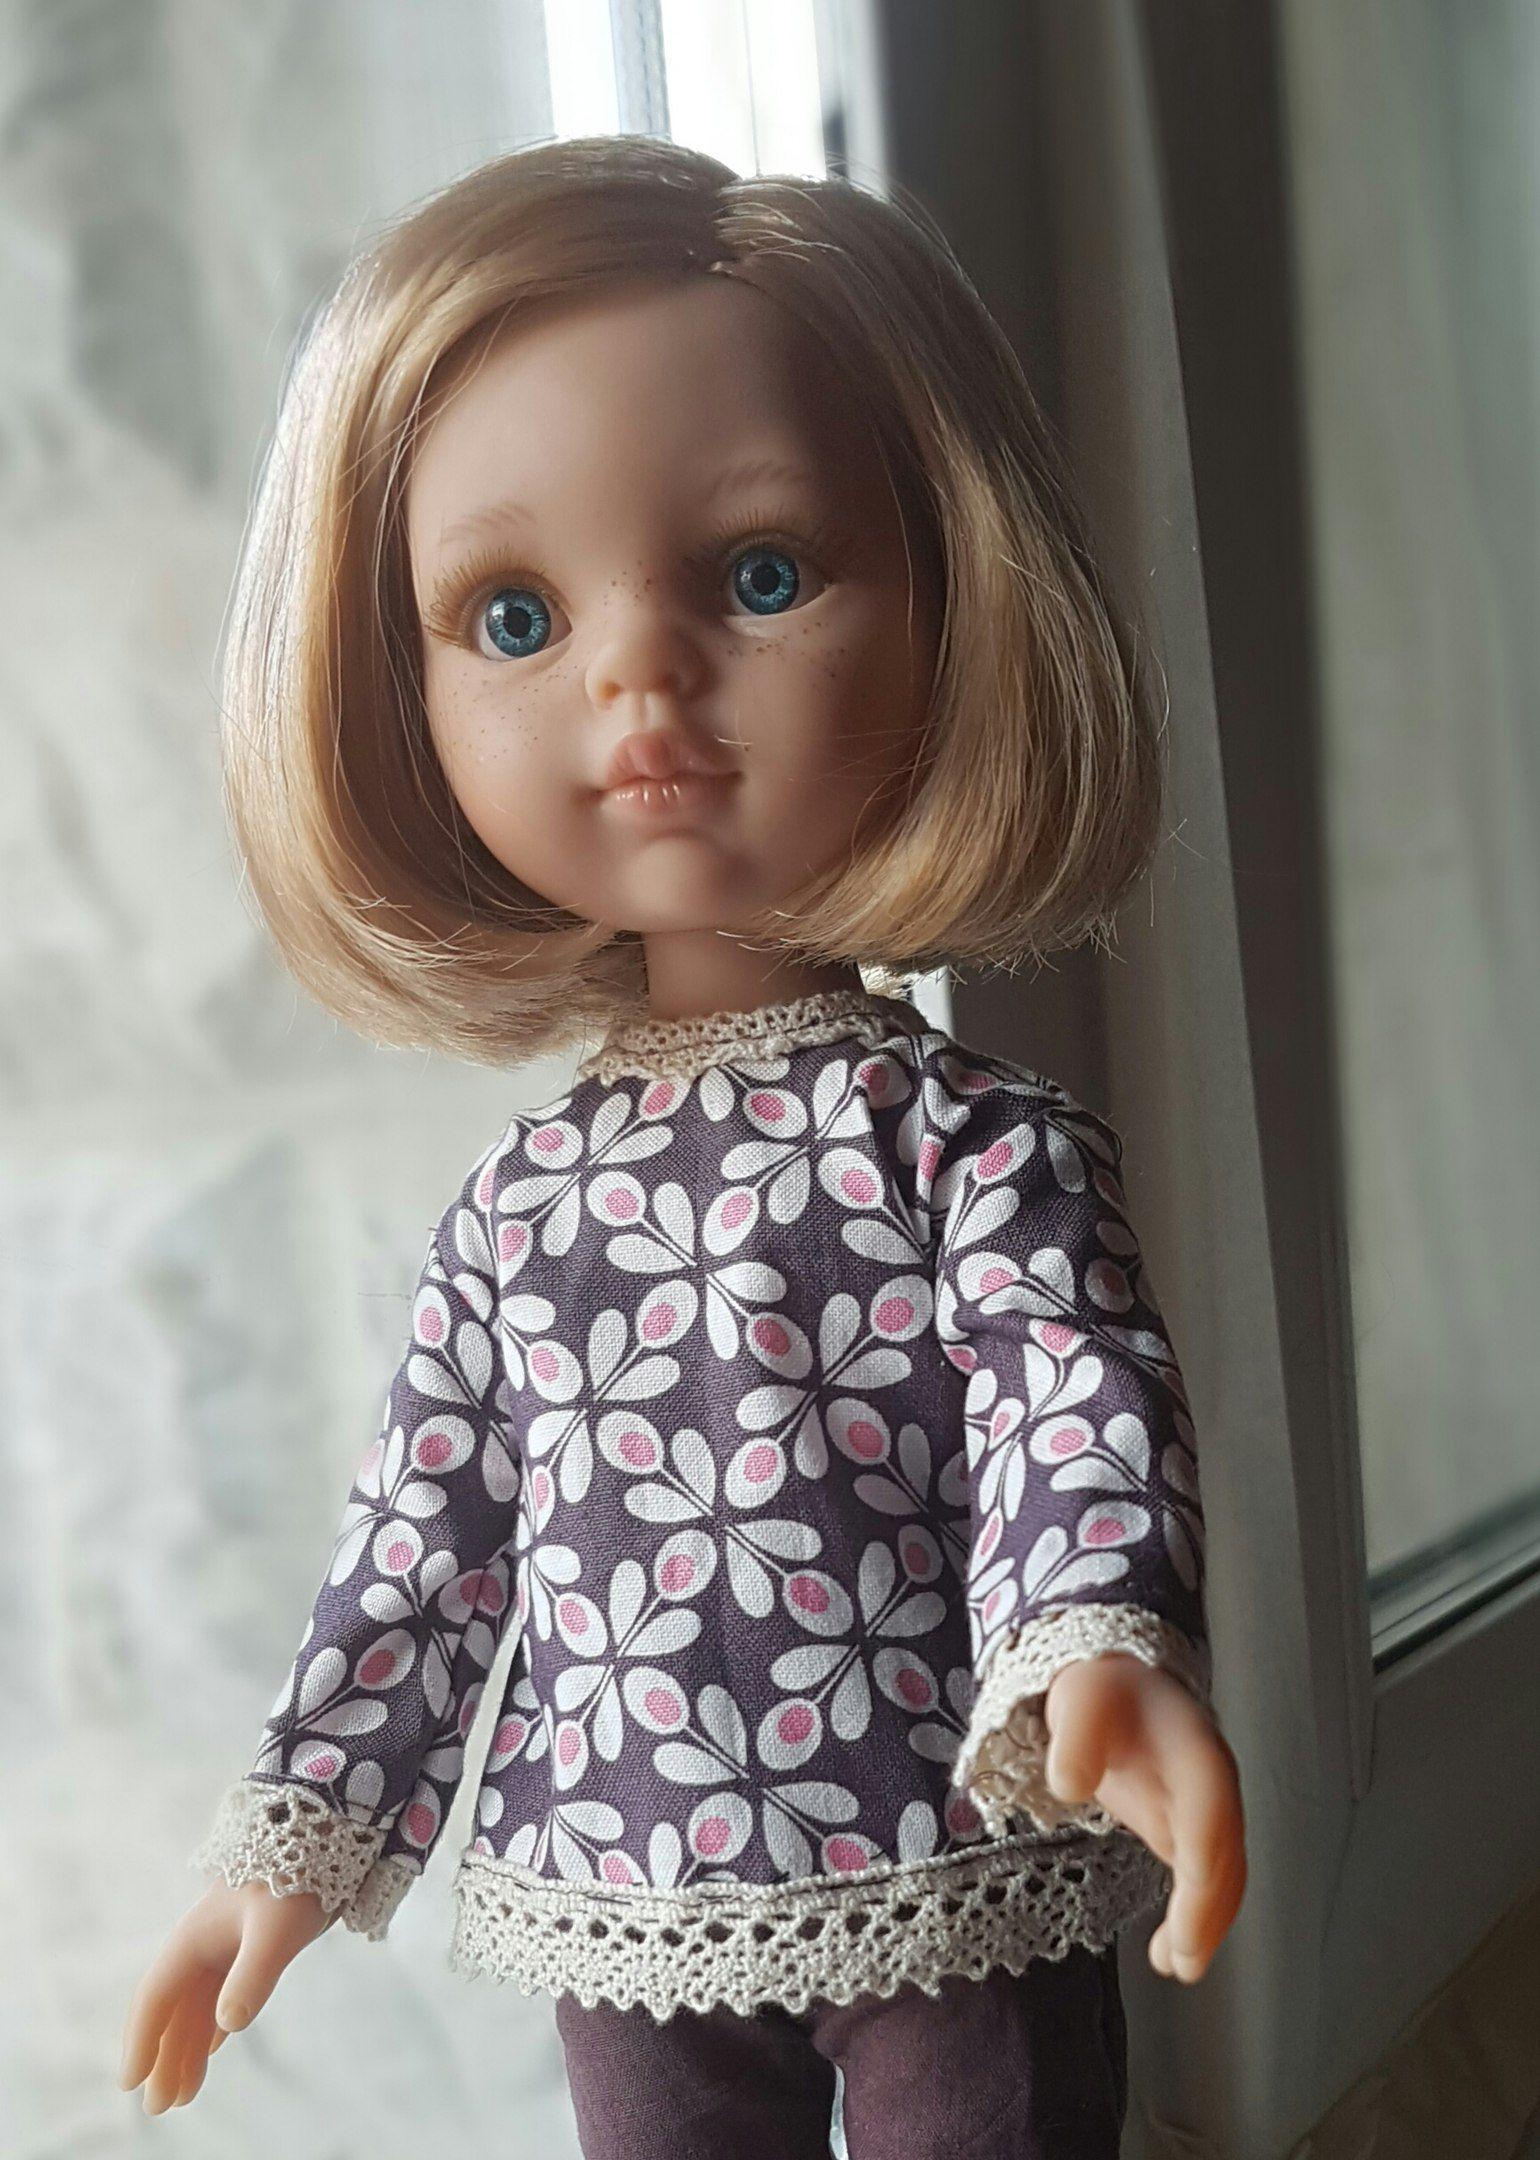 Продам куклу Paola Reina. – 72 фотографии